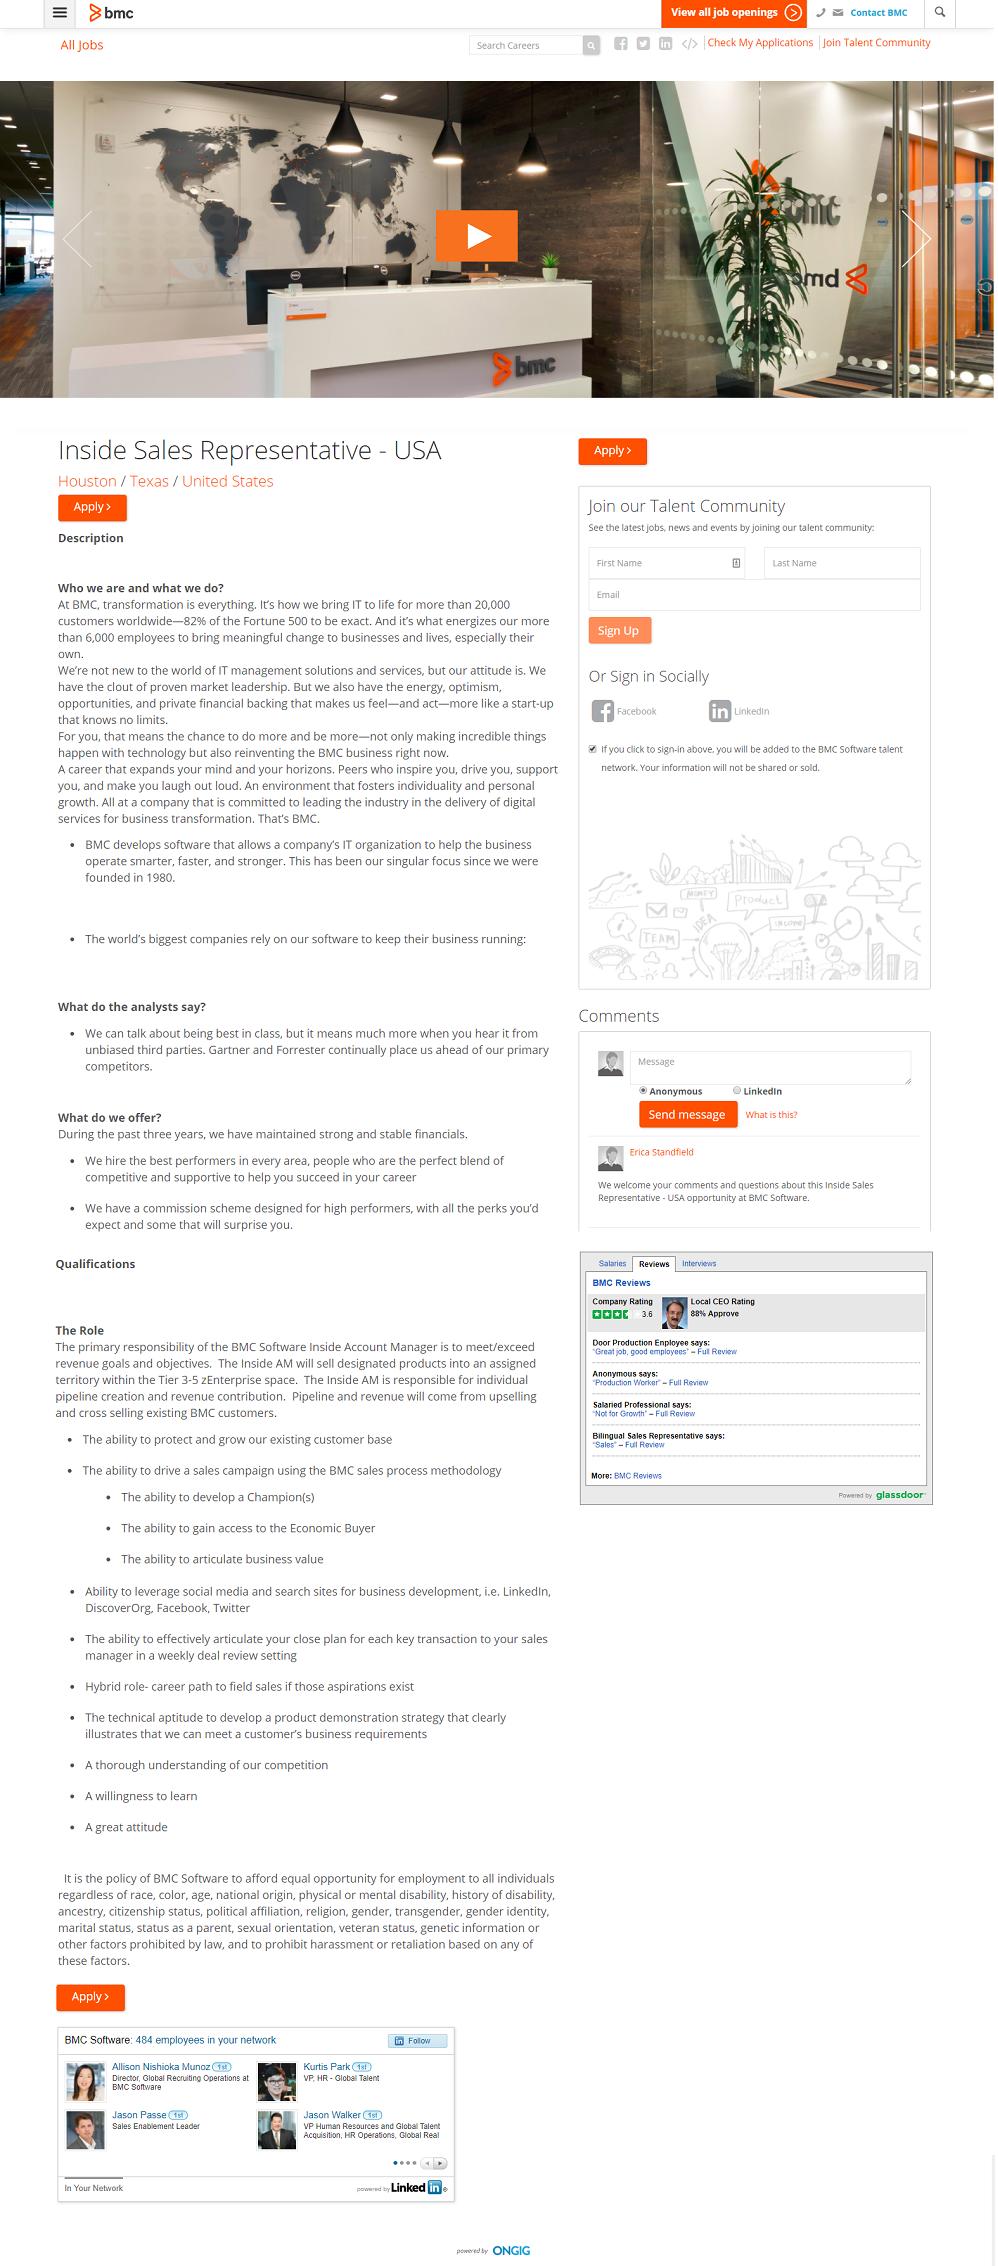 BMC Taleo ATS Job Page Powered By Ongig